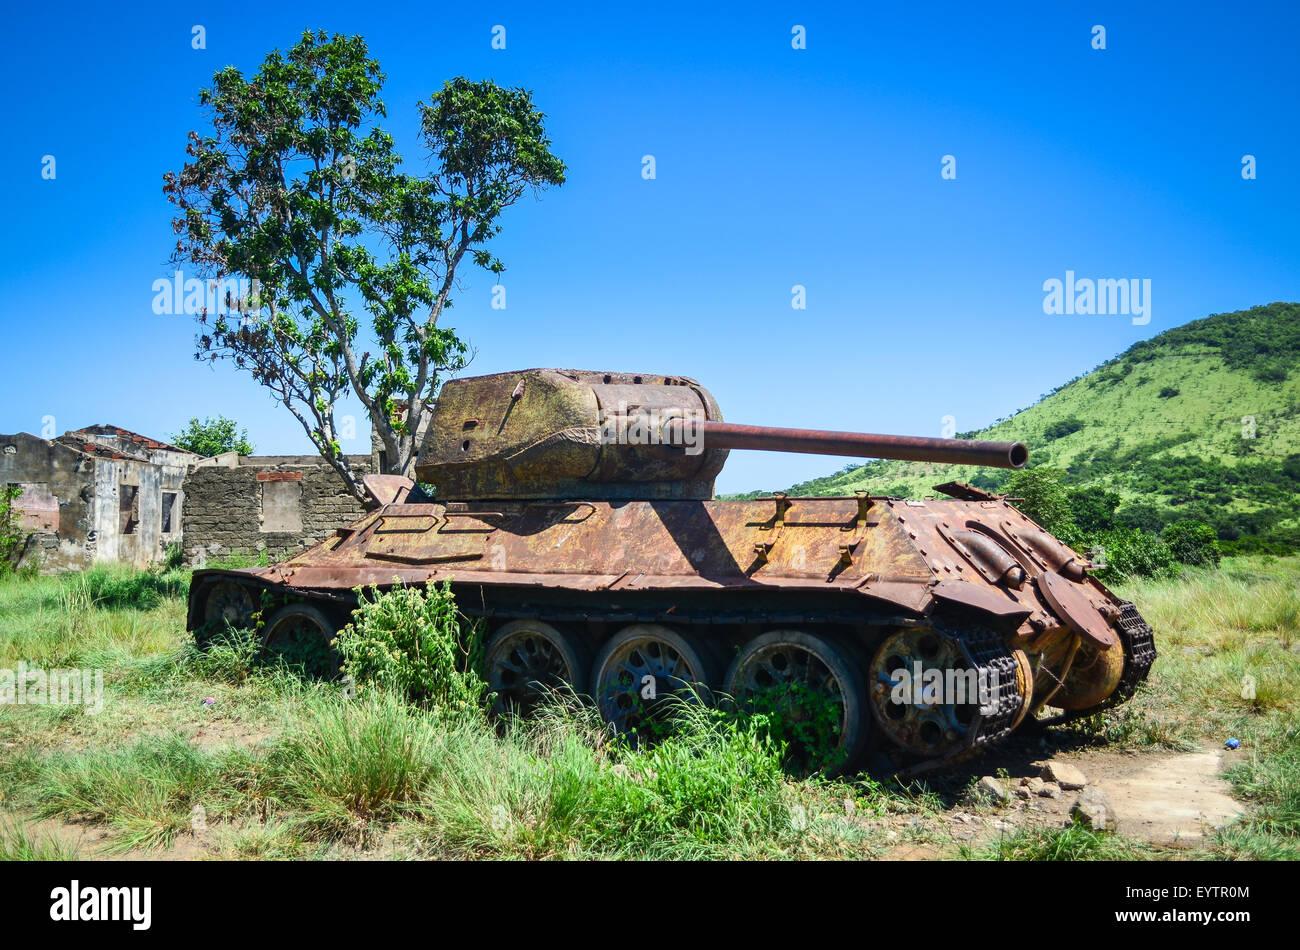 Abandoned rusty tank in Angola, following the civil war - Stock Image